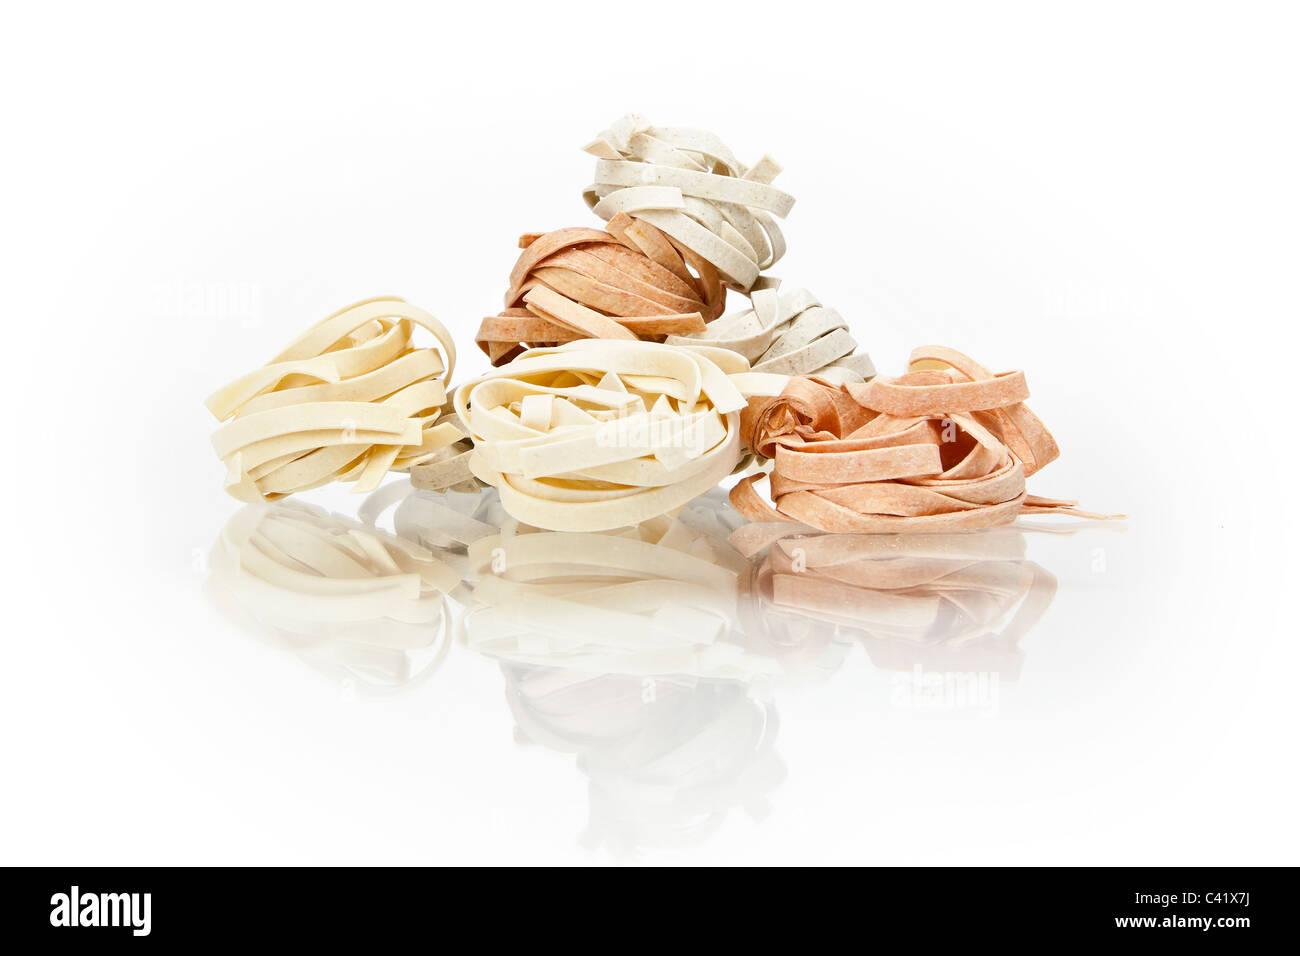 Tagliatelle pasta in three colors on white background - Stock Image